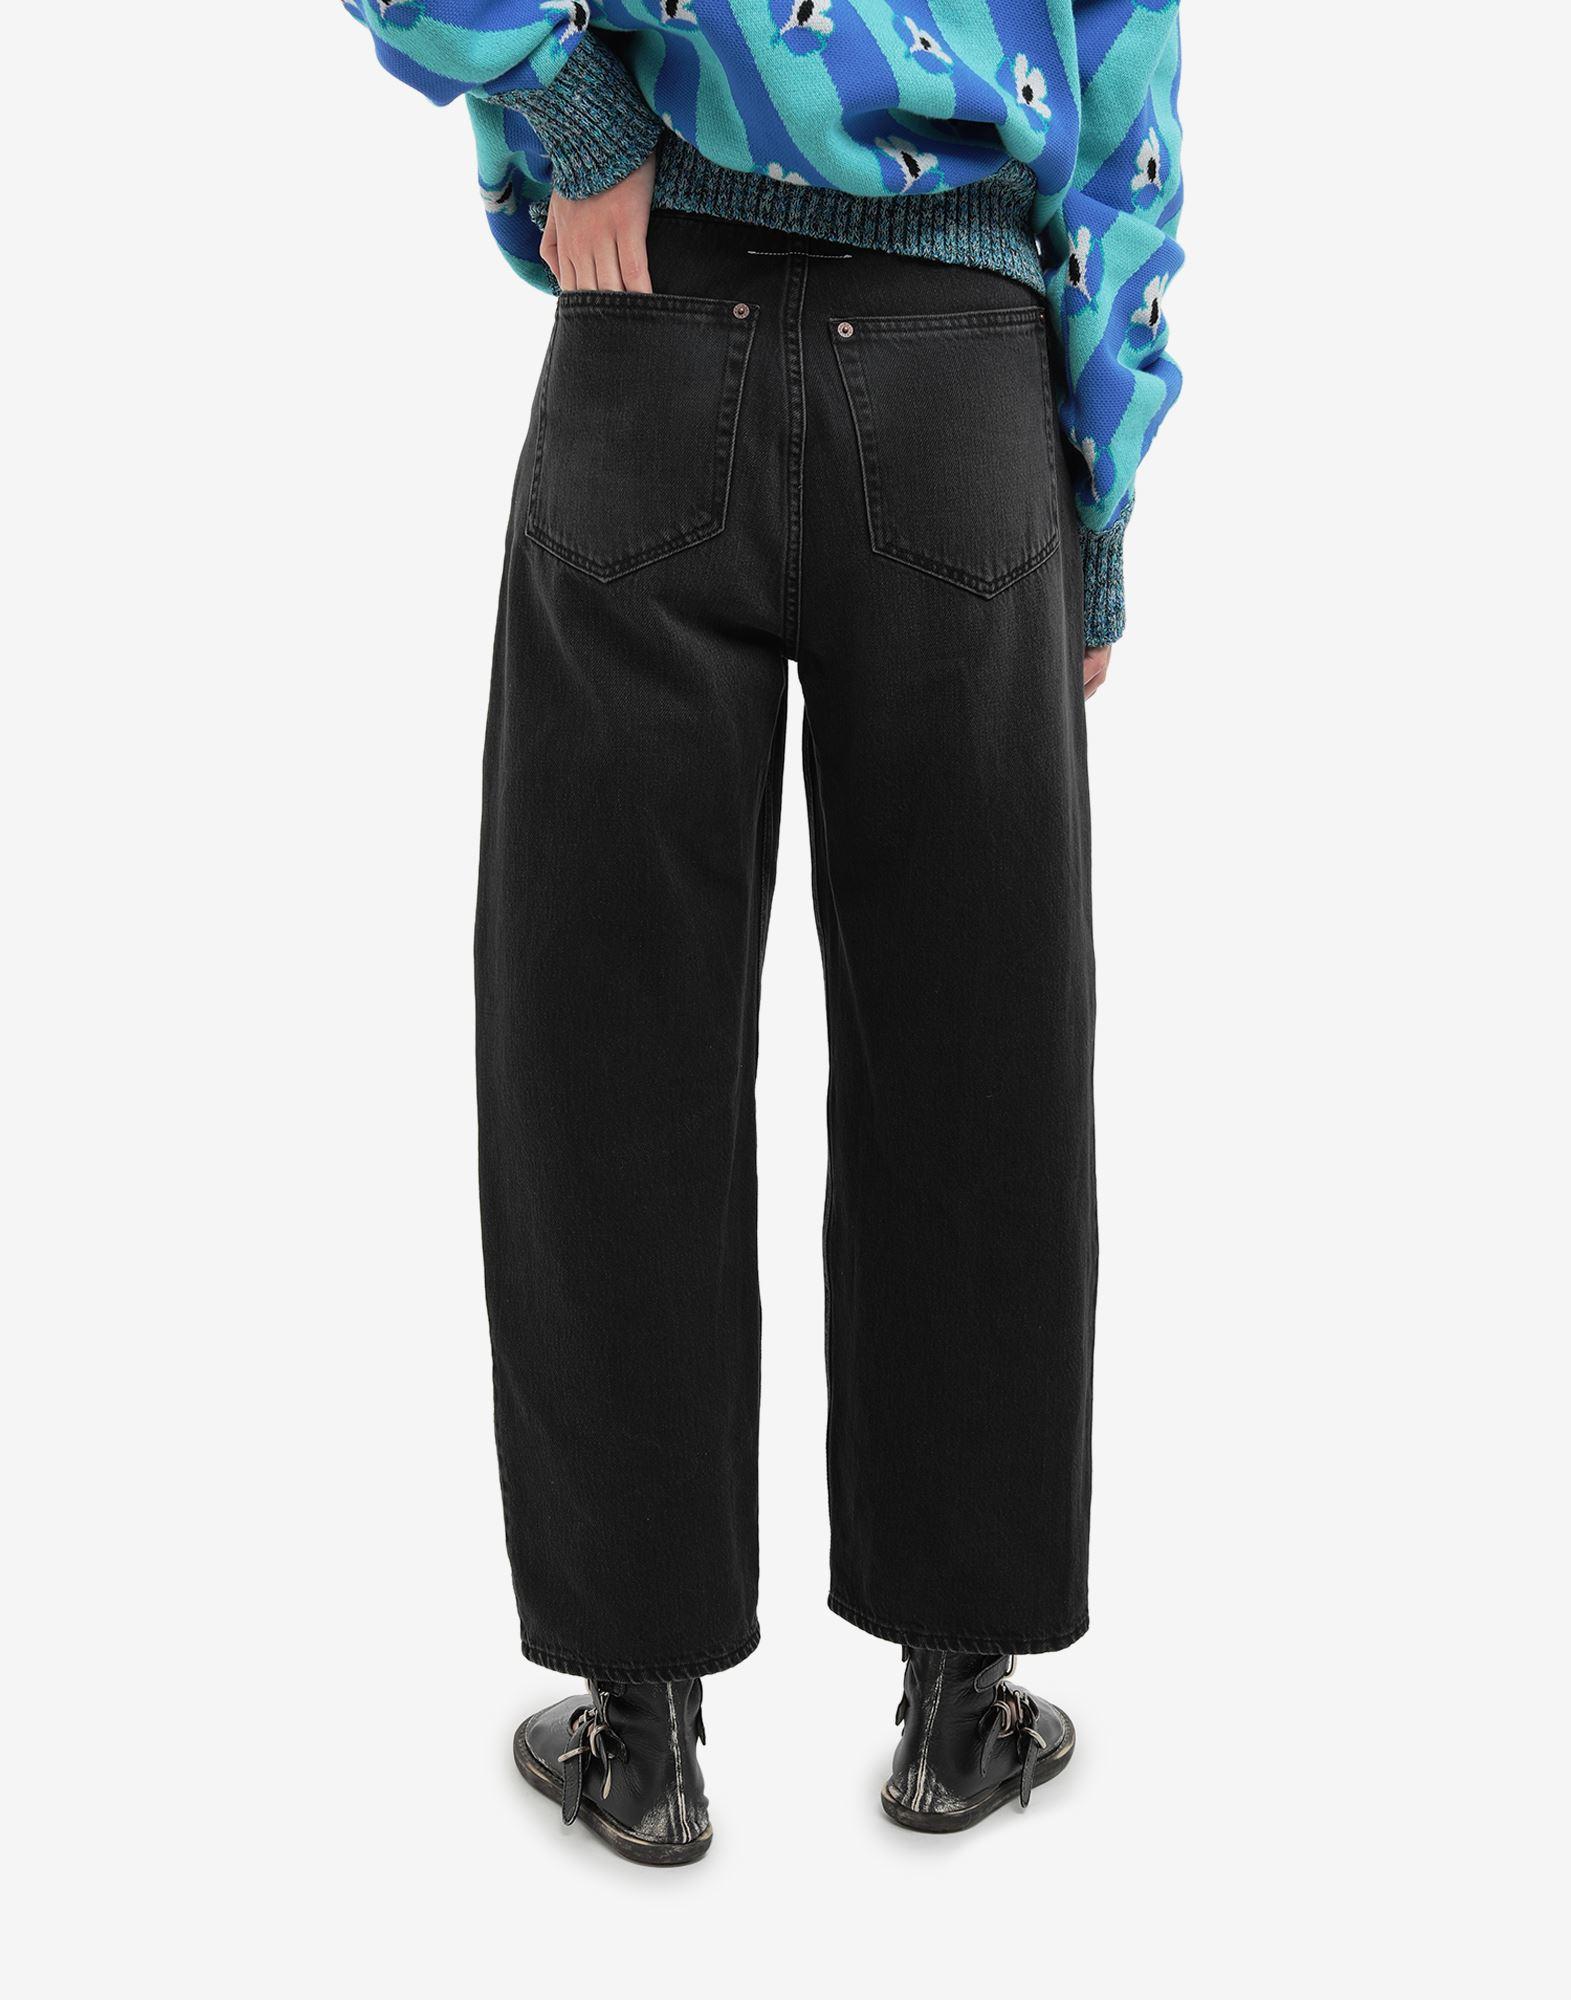 MM6 MAISON MARGIELA Jean taille haute Pantalon en jean Femme e